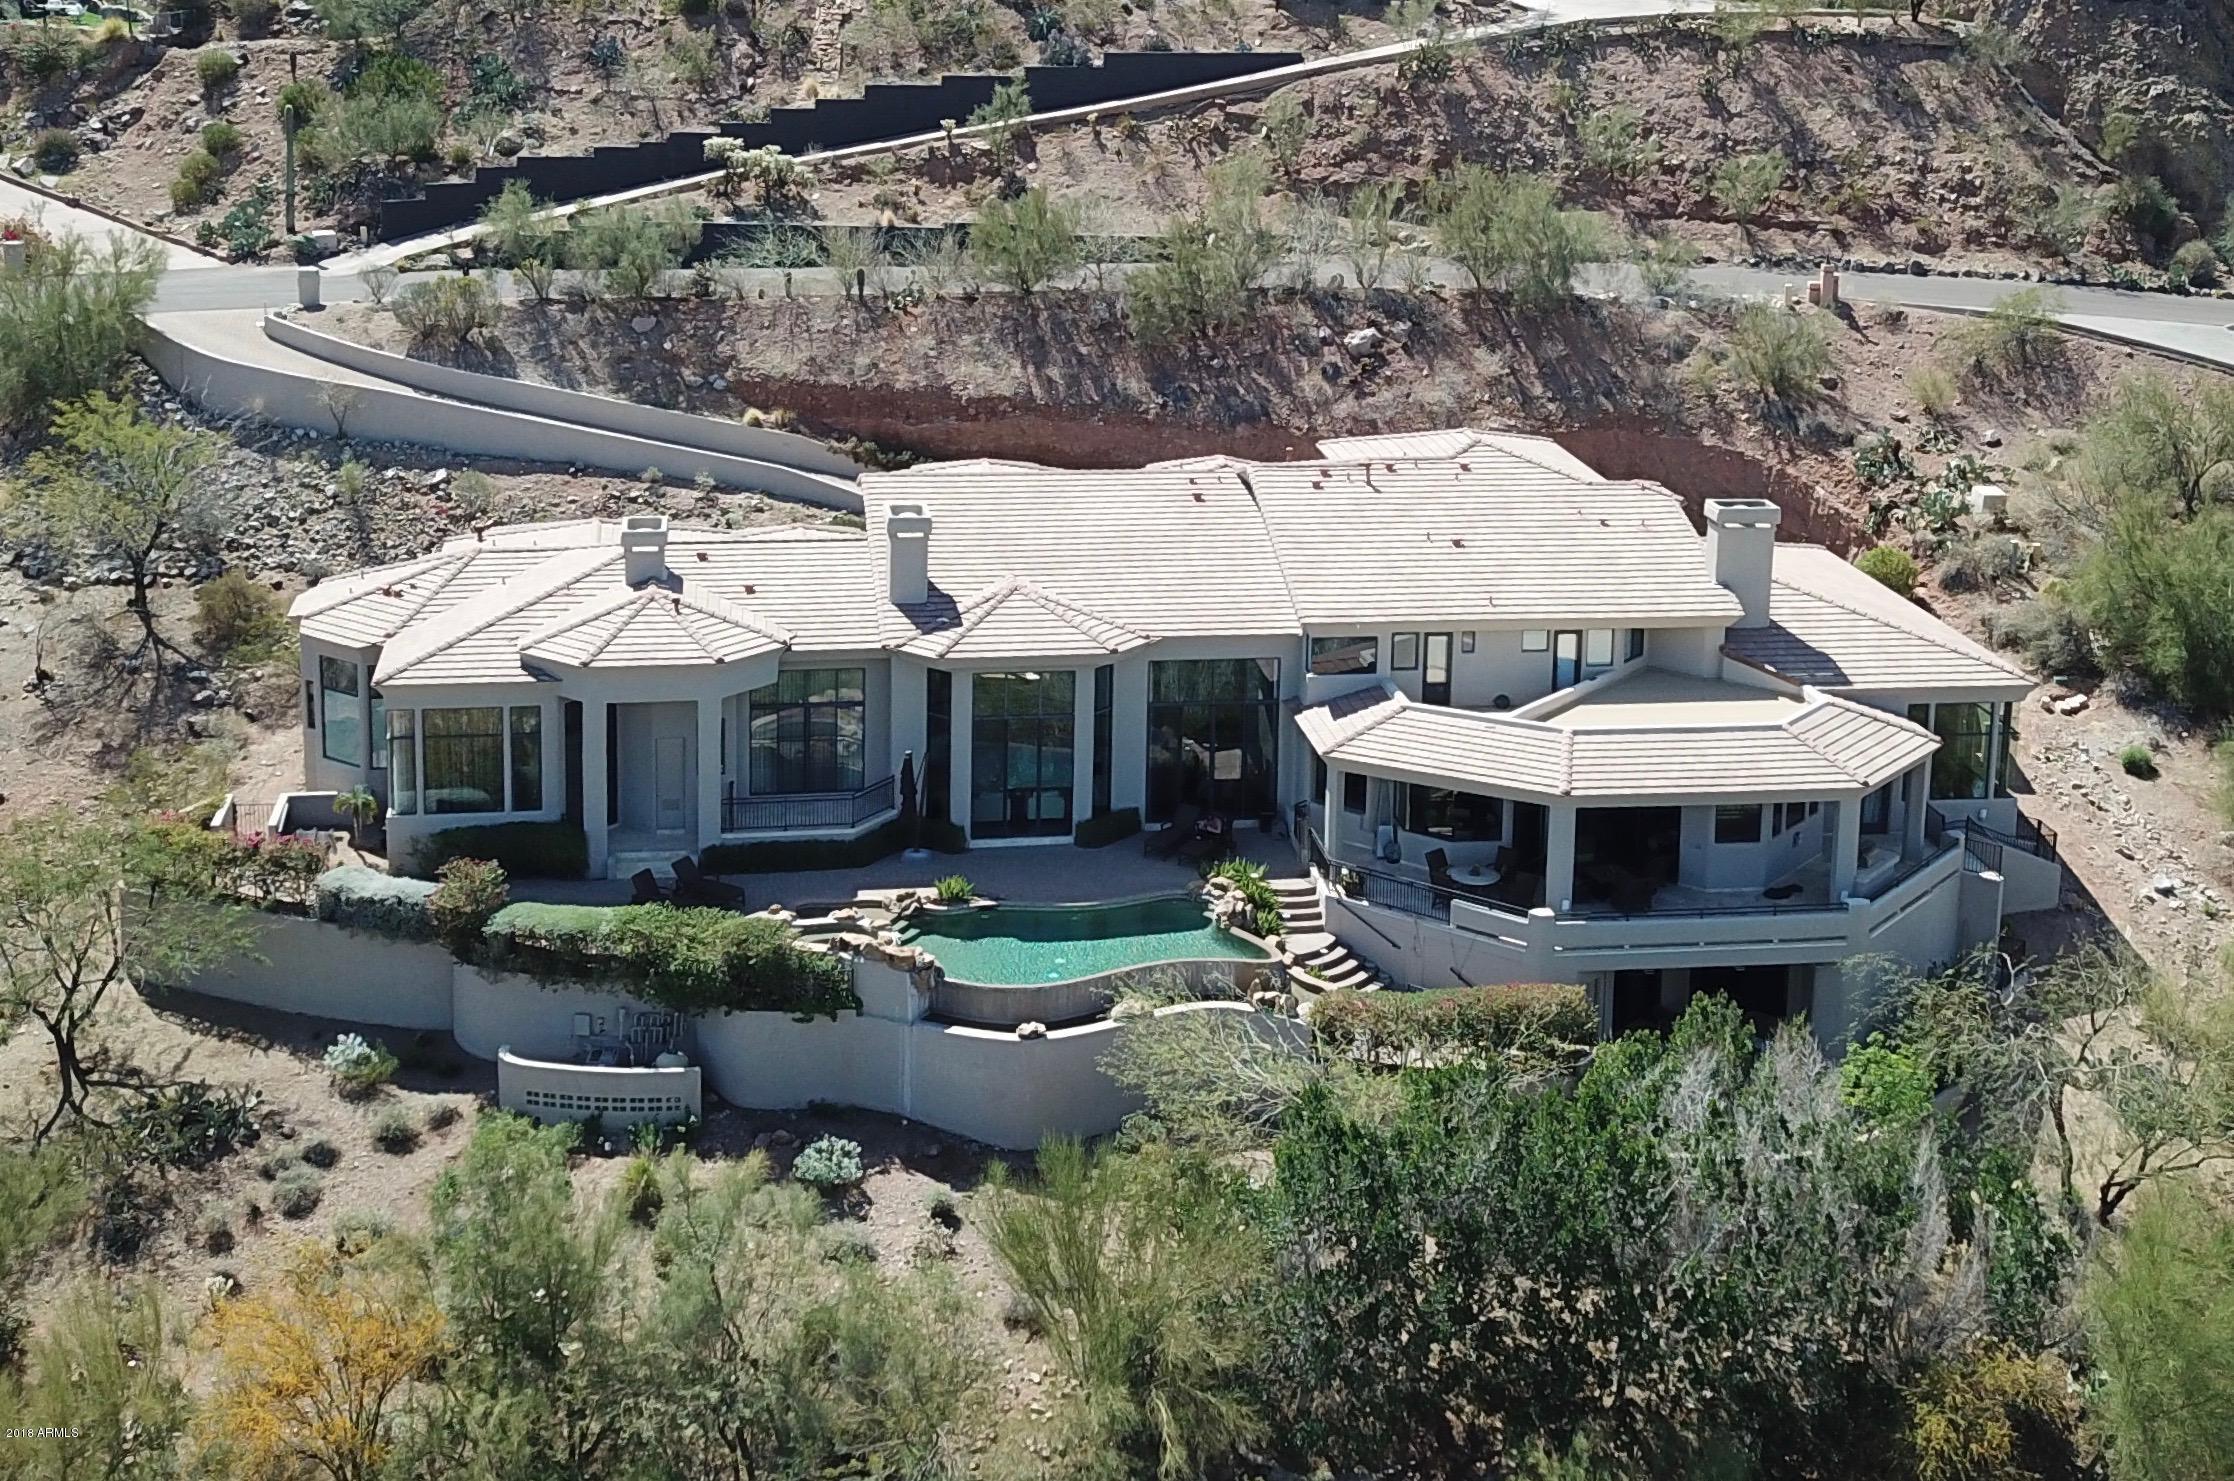 MLS 5738686 5060 E VALLE VISTA Way, Paradise Valley, AZ 85253